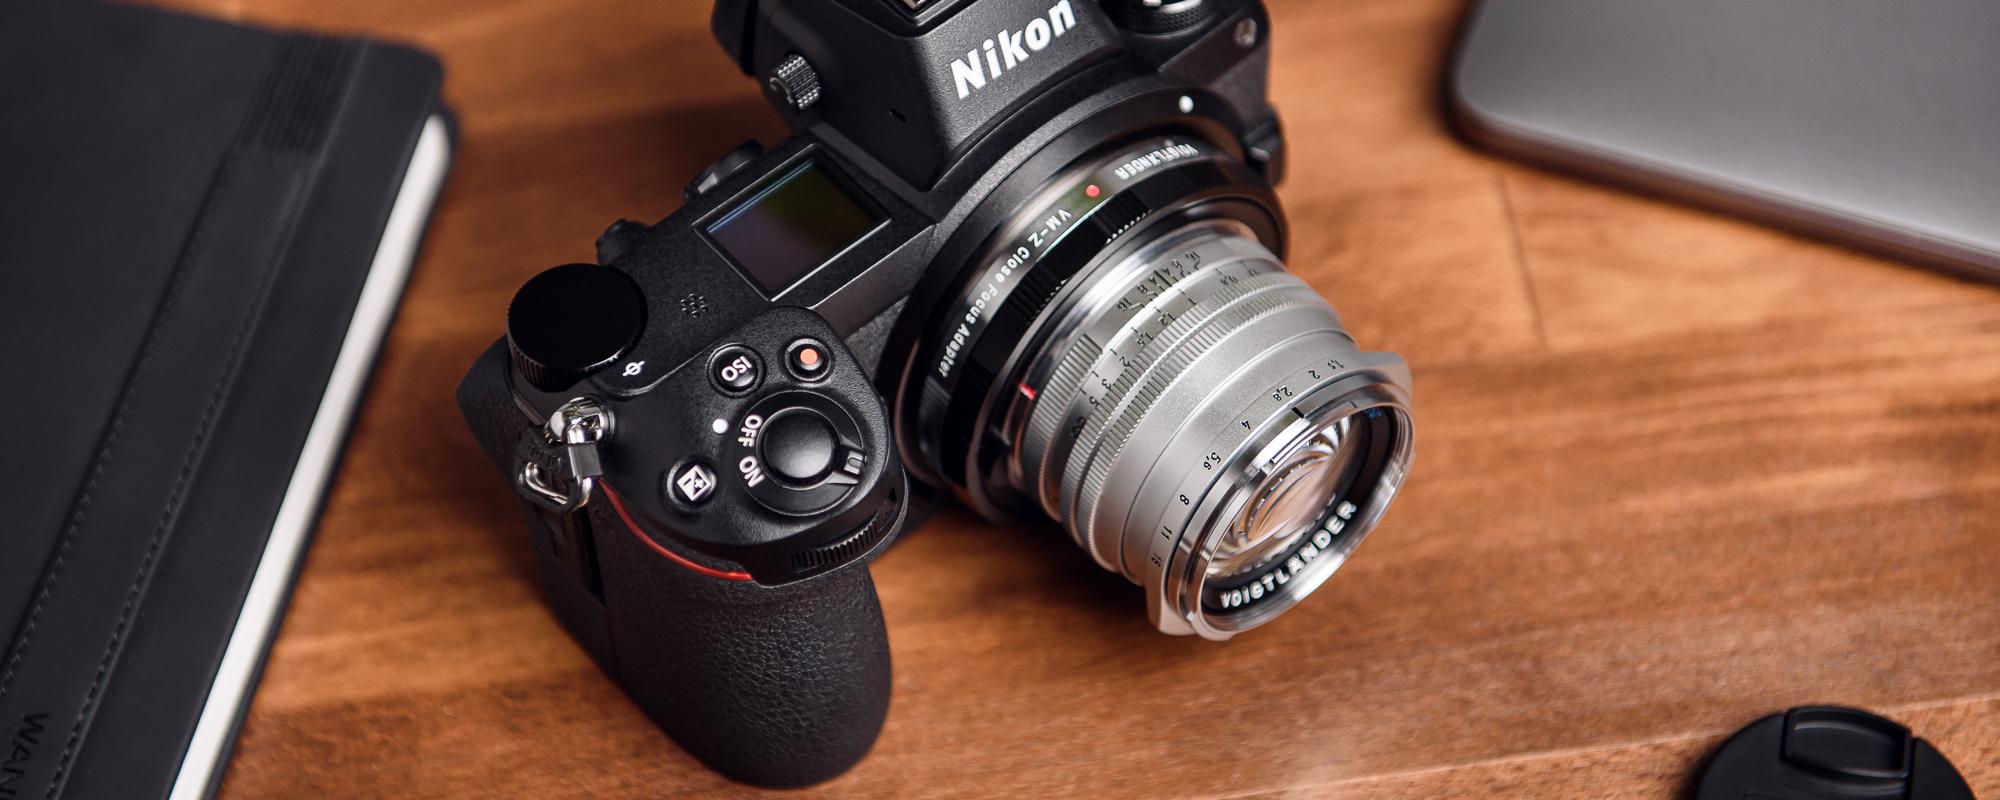 Voigtlander Nokton II 50 mm f/1.5 lens for Leica M - SC, silver on camera